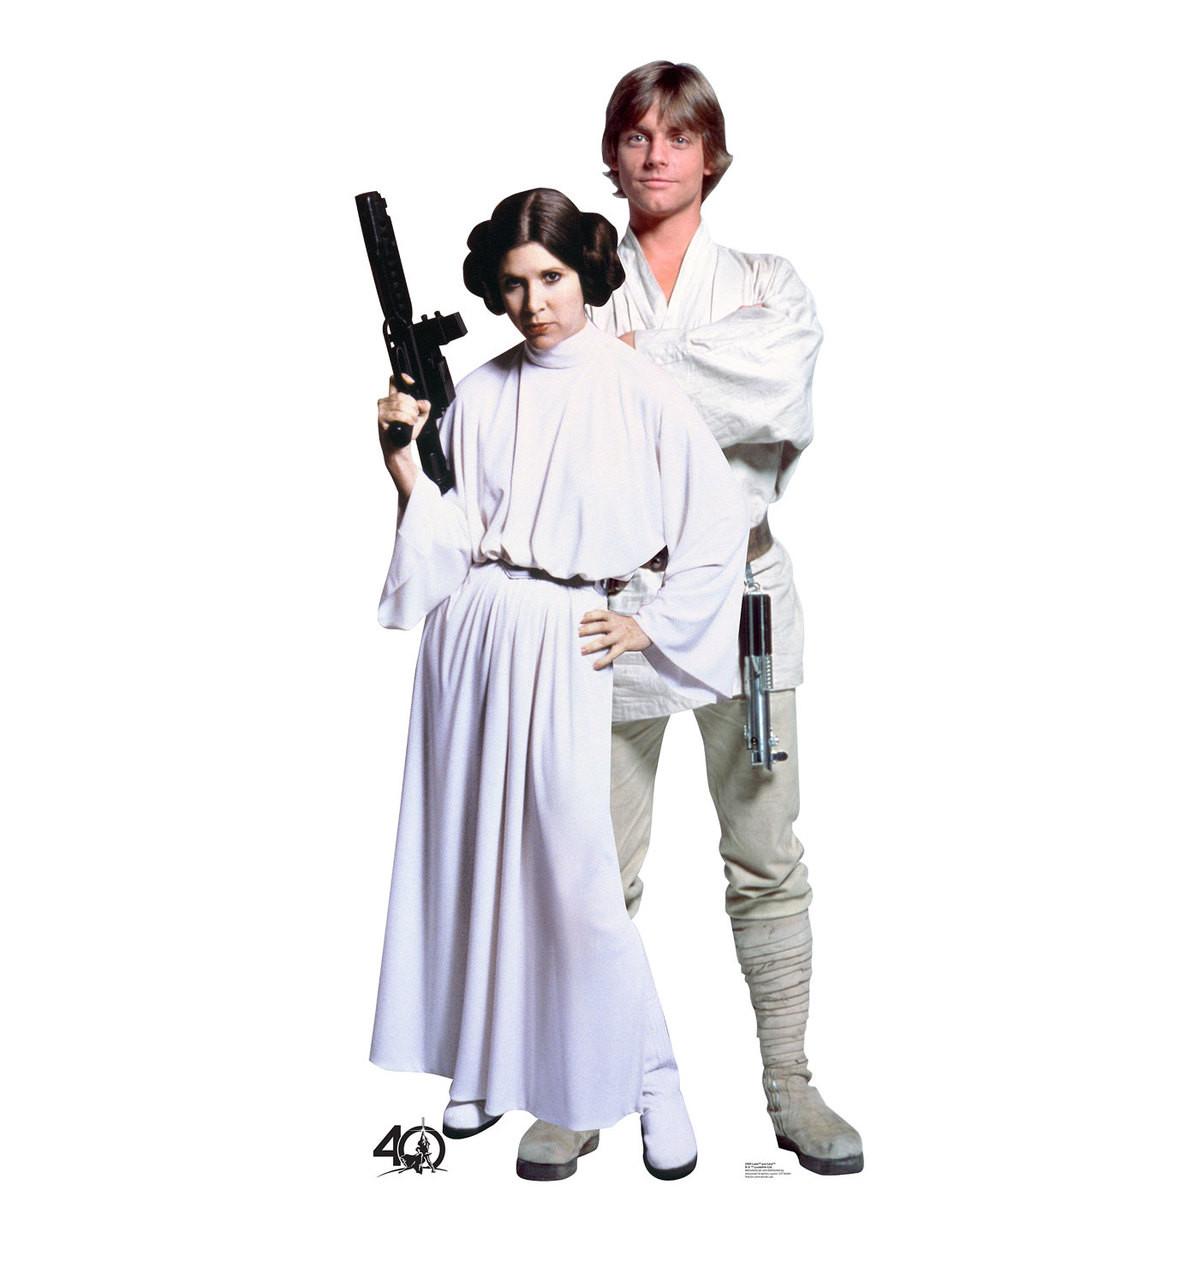 Life-size Luke and Leia  (Star Wars 40th) Cardboard Standup | Cardboard Cutout 3